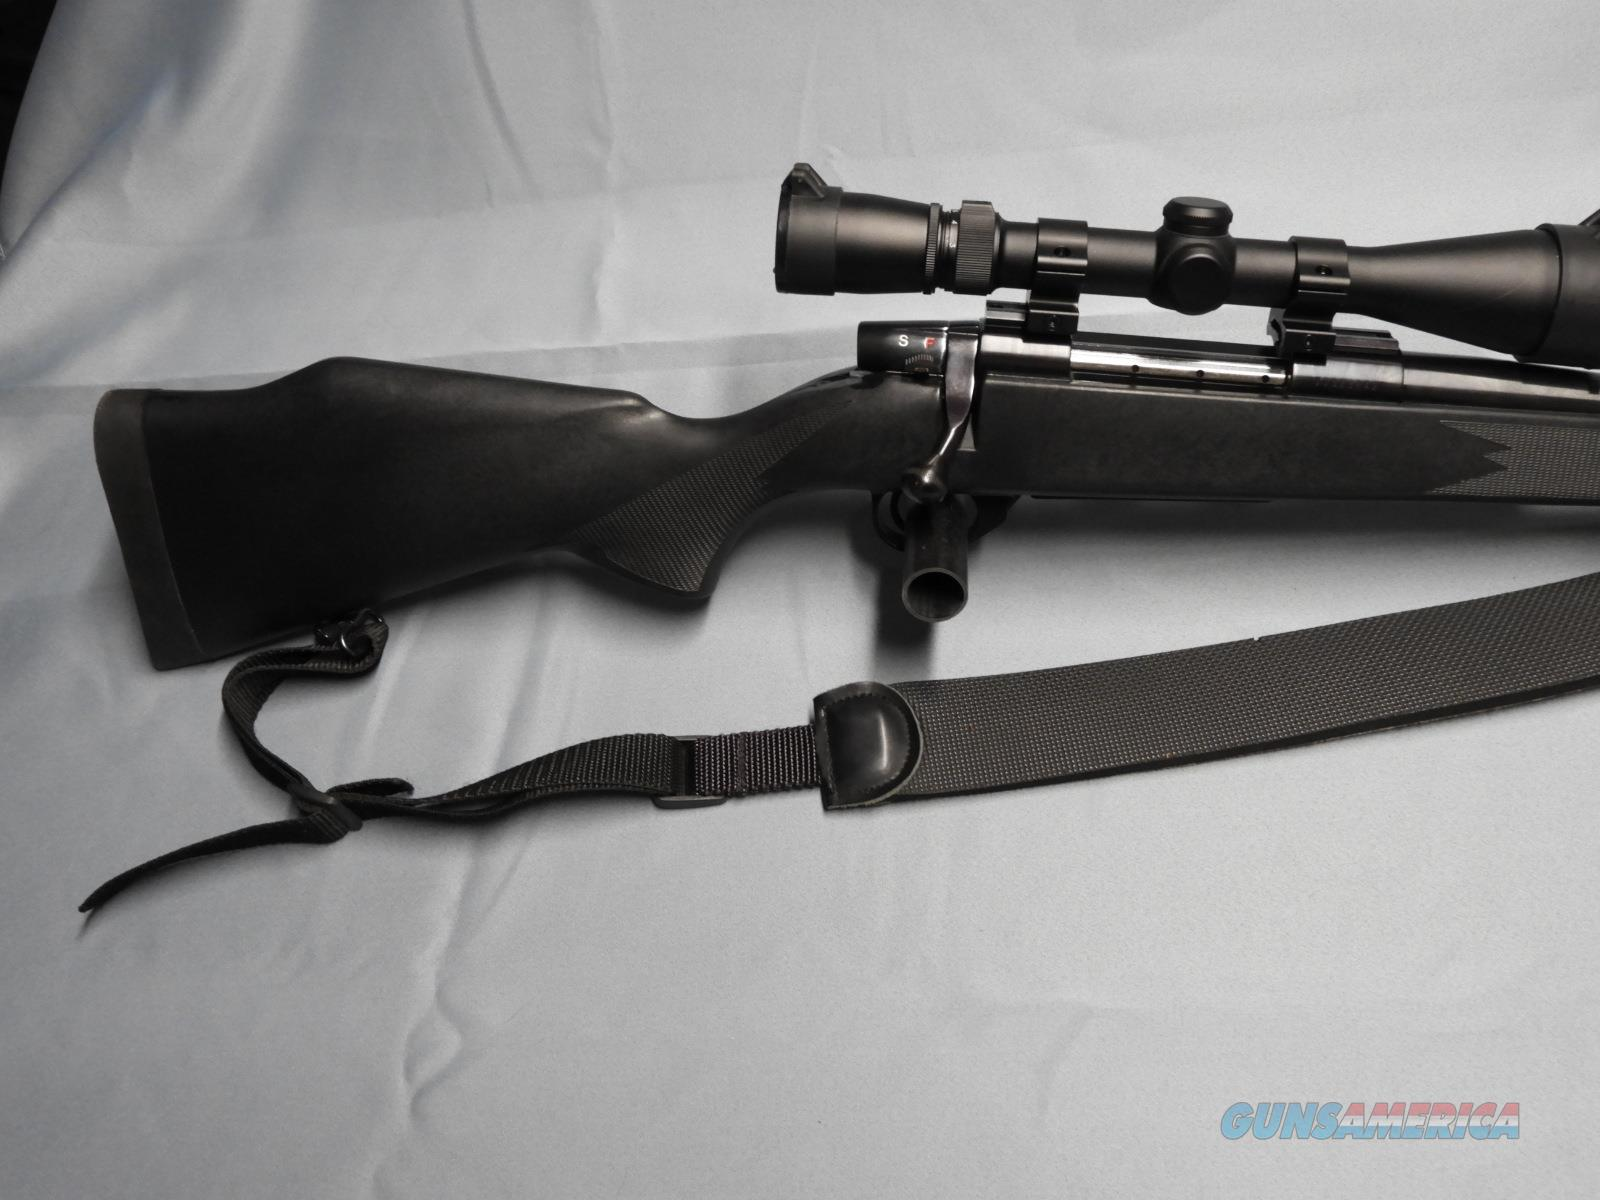 Weatherby Vanguard 257 mag  Guns > Rifles > Weatherby Rifles > Sporting